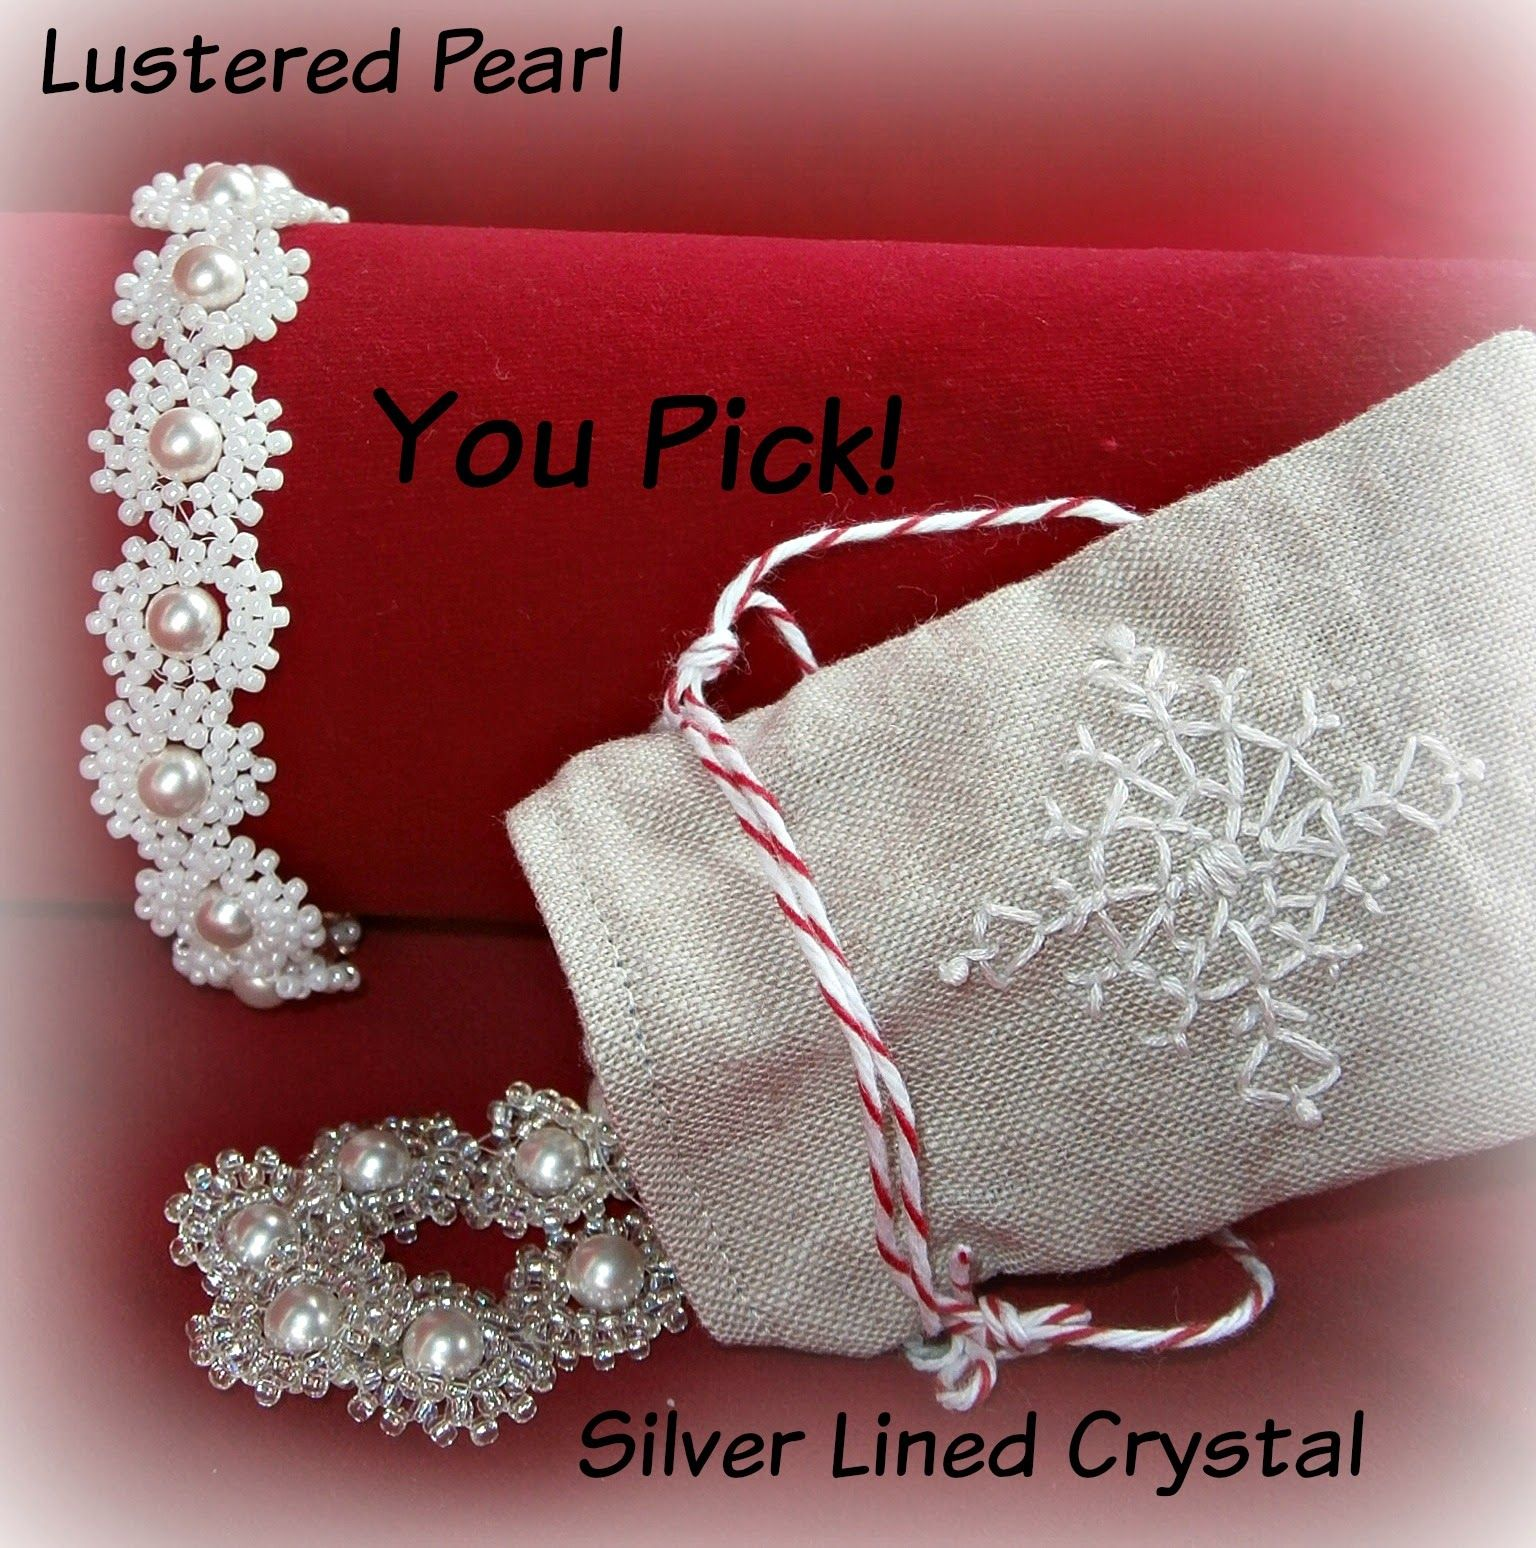 Secretly Stitching: Christmas Gift Giveaway